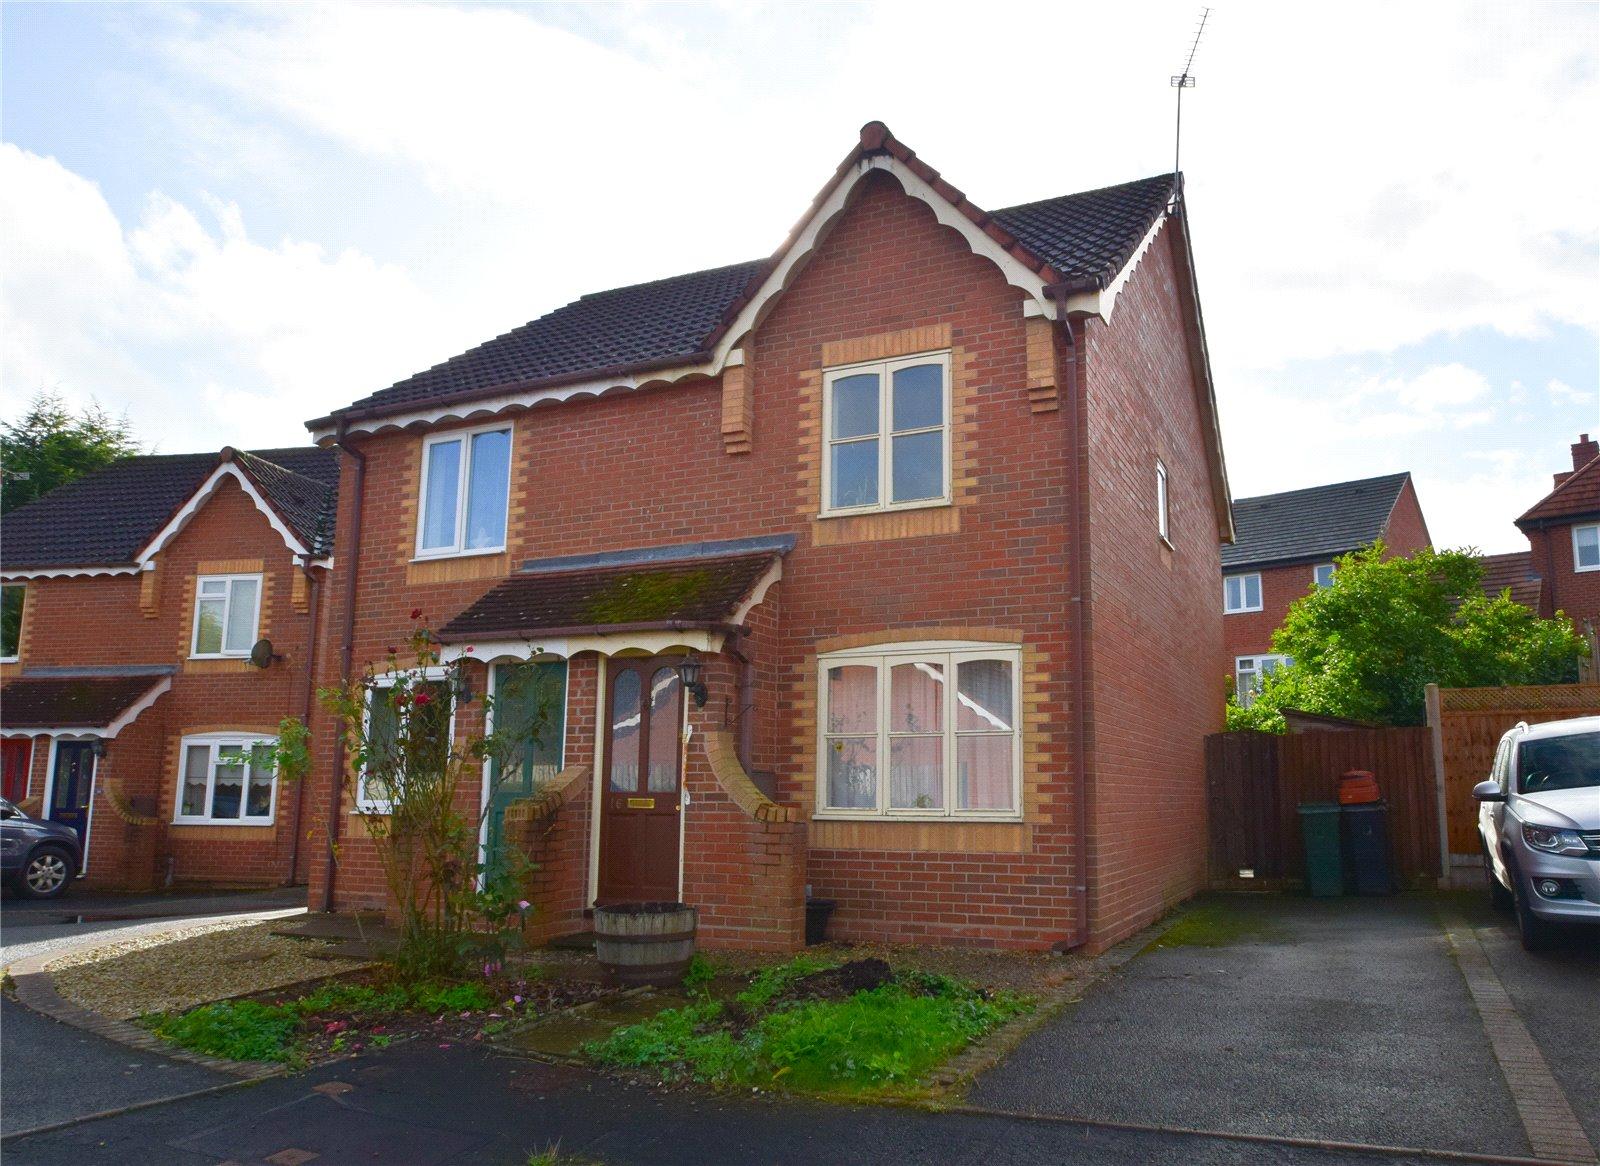 16 Hartmann Close, Cleobury Mortimer, Kidderminster, Shropshire, DY14